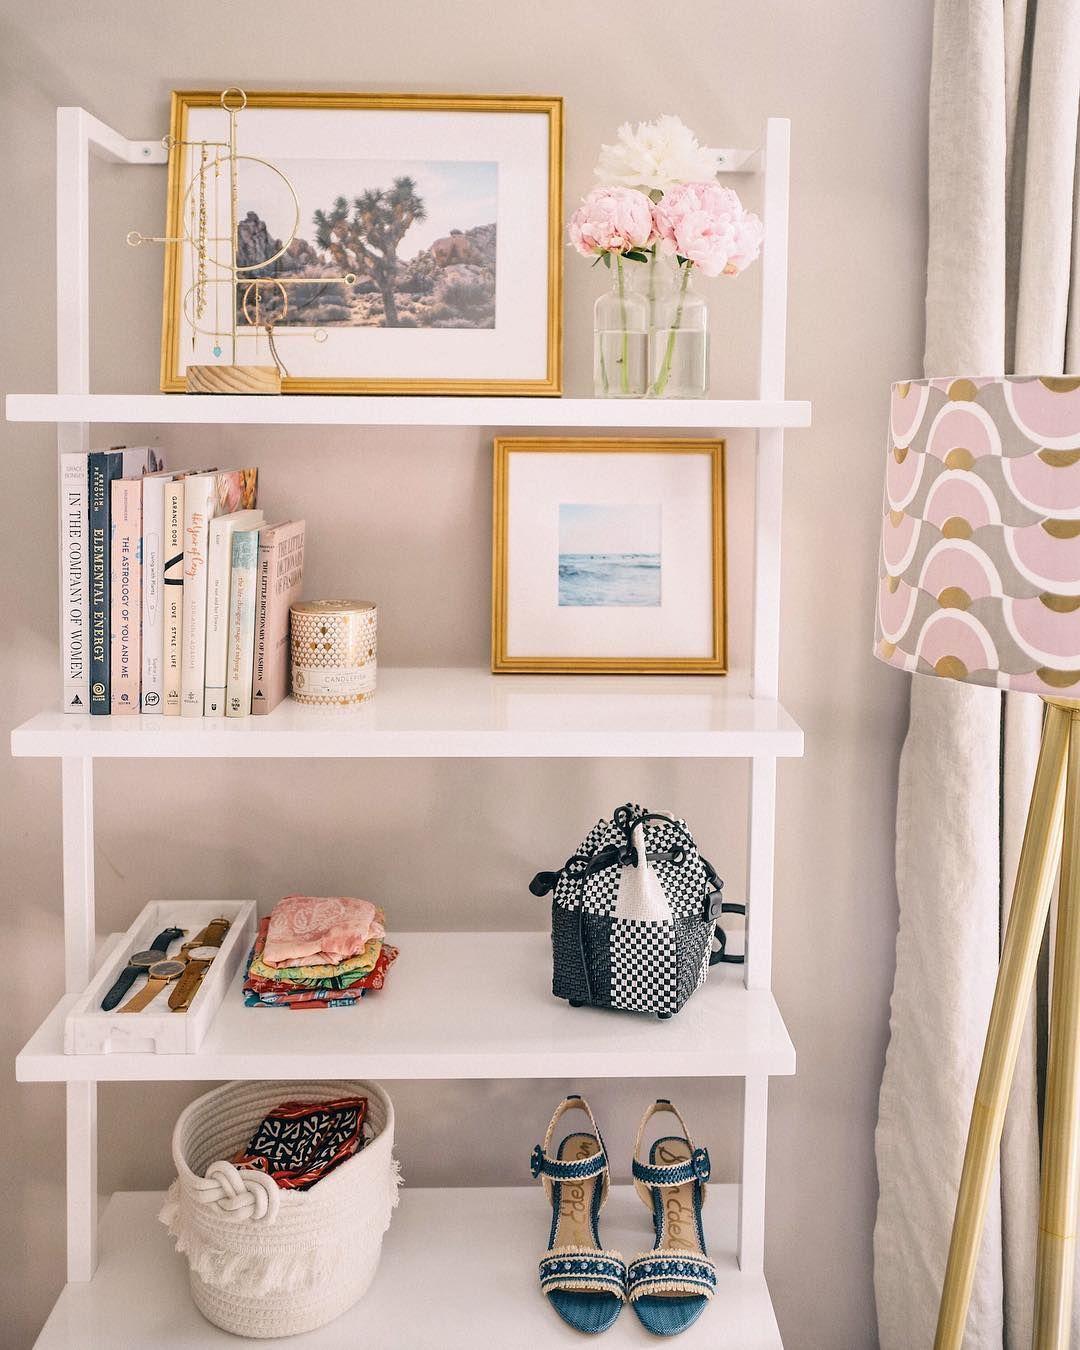 115 8 M Seguidores 696 A Seguir 3 756 Publicacoes Ver Fotos E Videos Do Instagram De Jess Newport Ri Guest Bedroom Design Bedroom Design Fall Home Decor